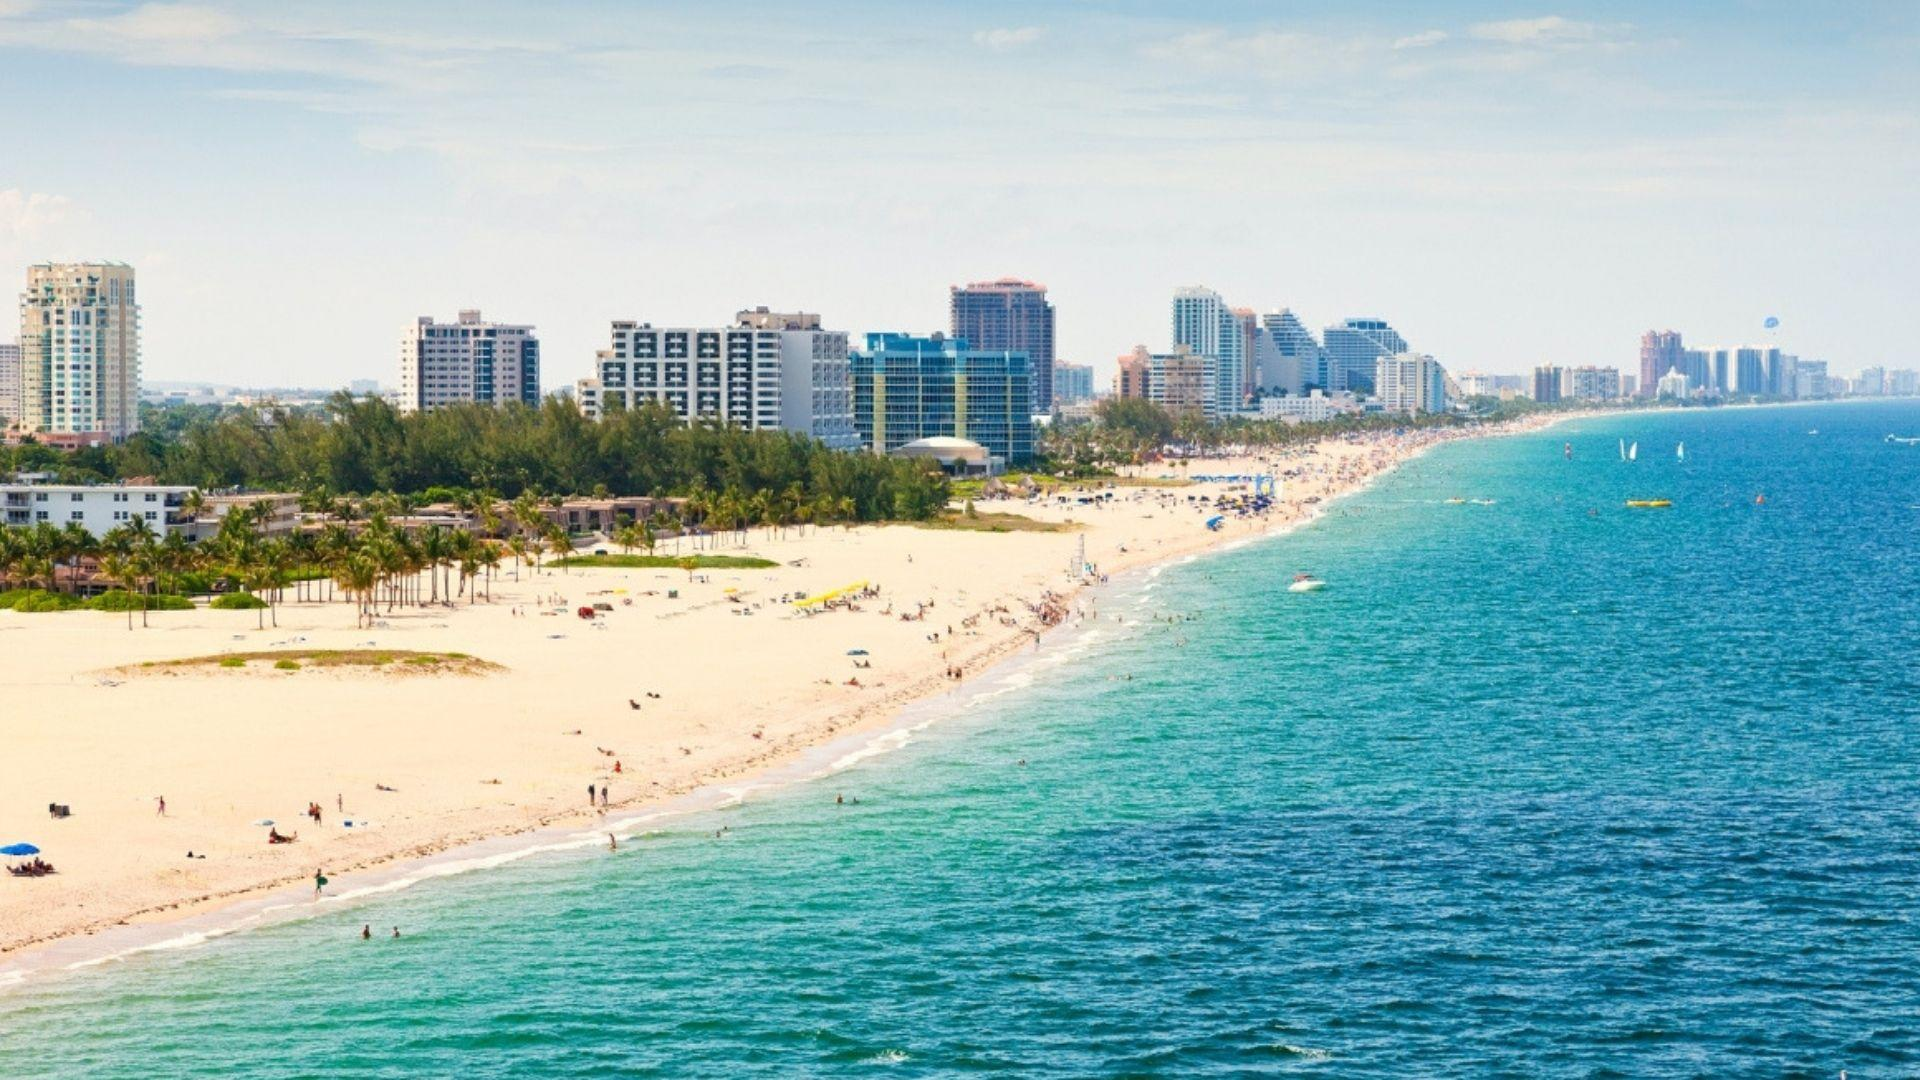 Fort Lauderdale žavingas paplūdimys